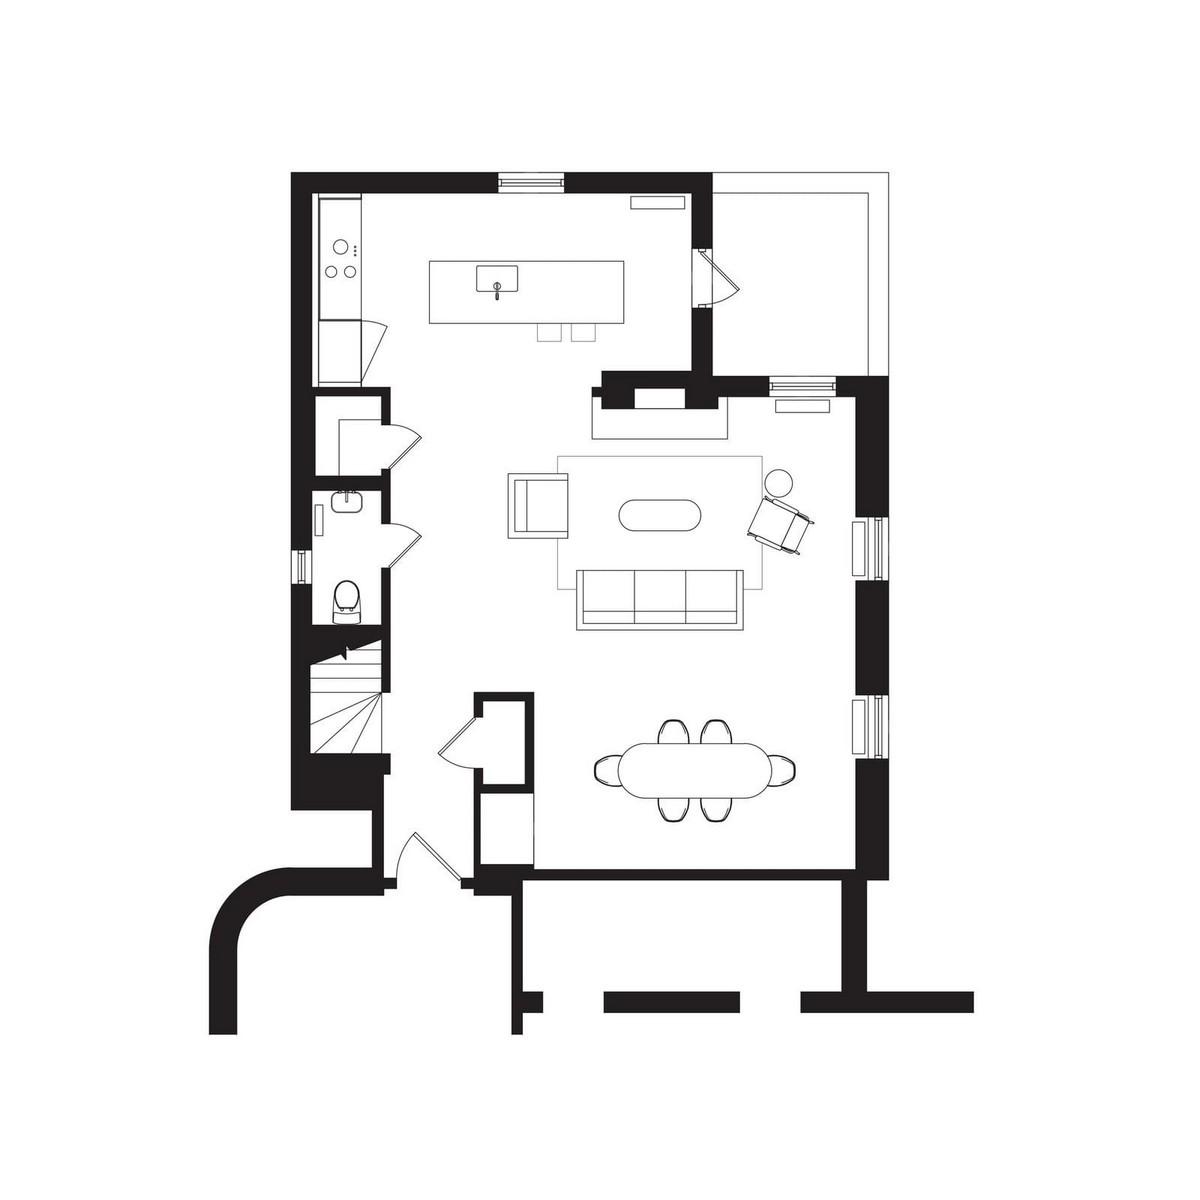 Двухуровневая квартира в бруклинском доме XIX века